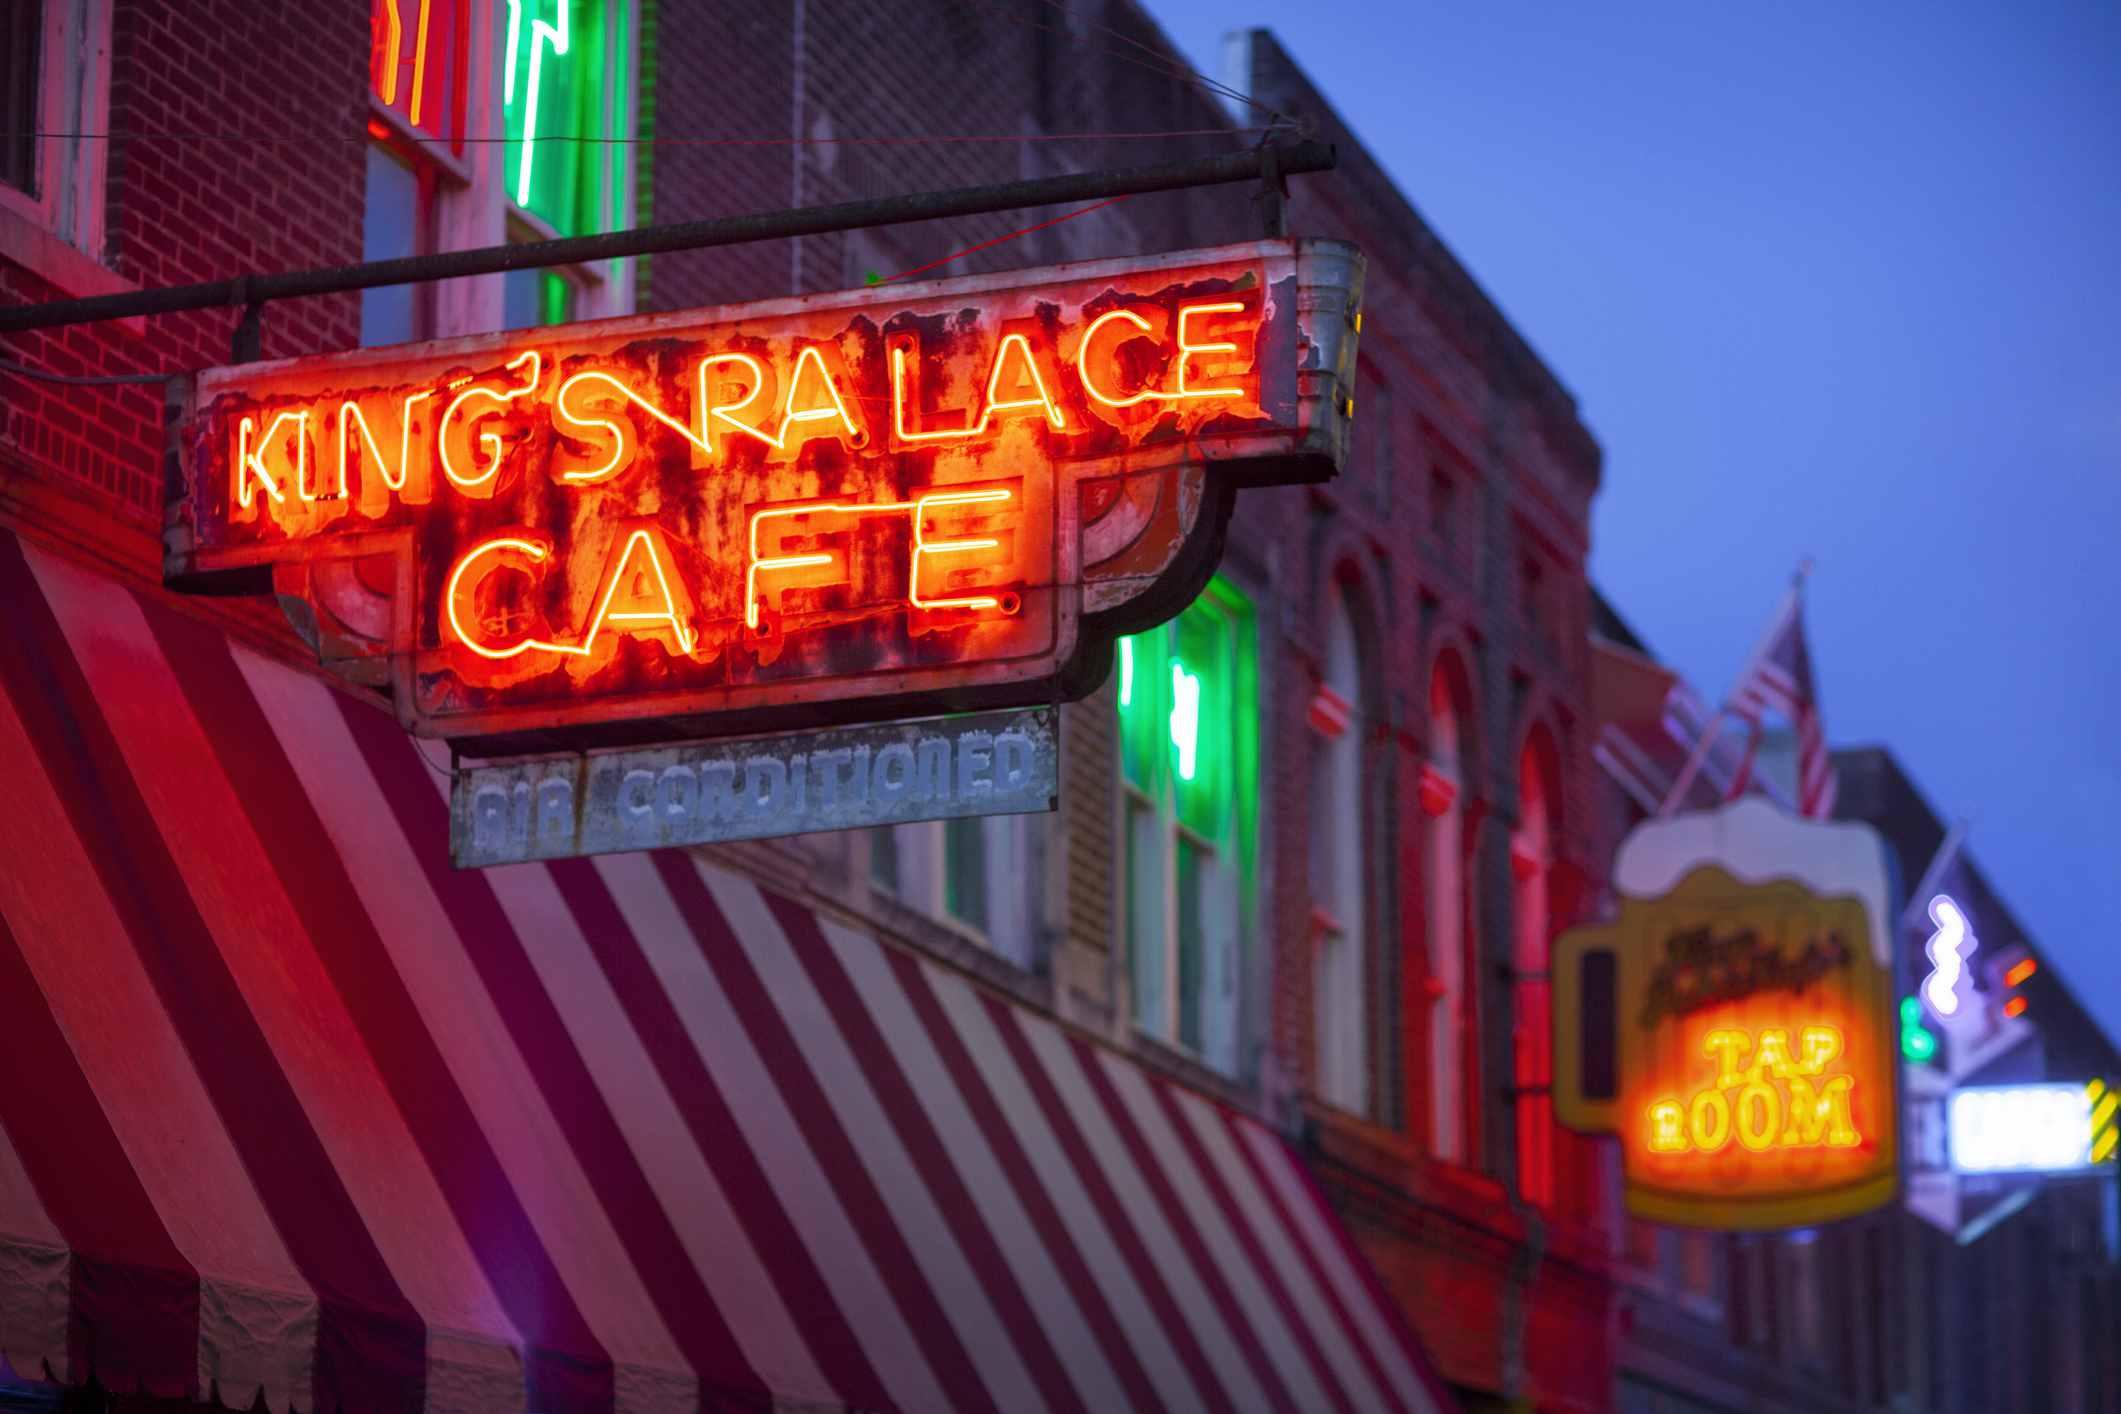 King's Palace Cafe on Beale Street, Memphis, TN